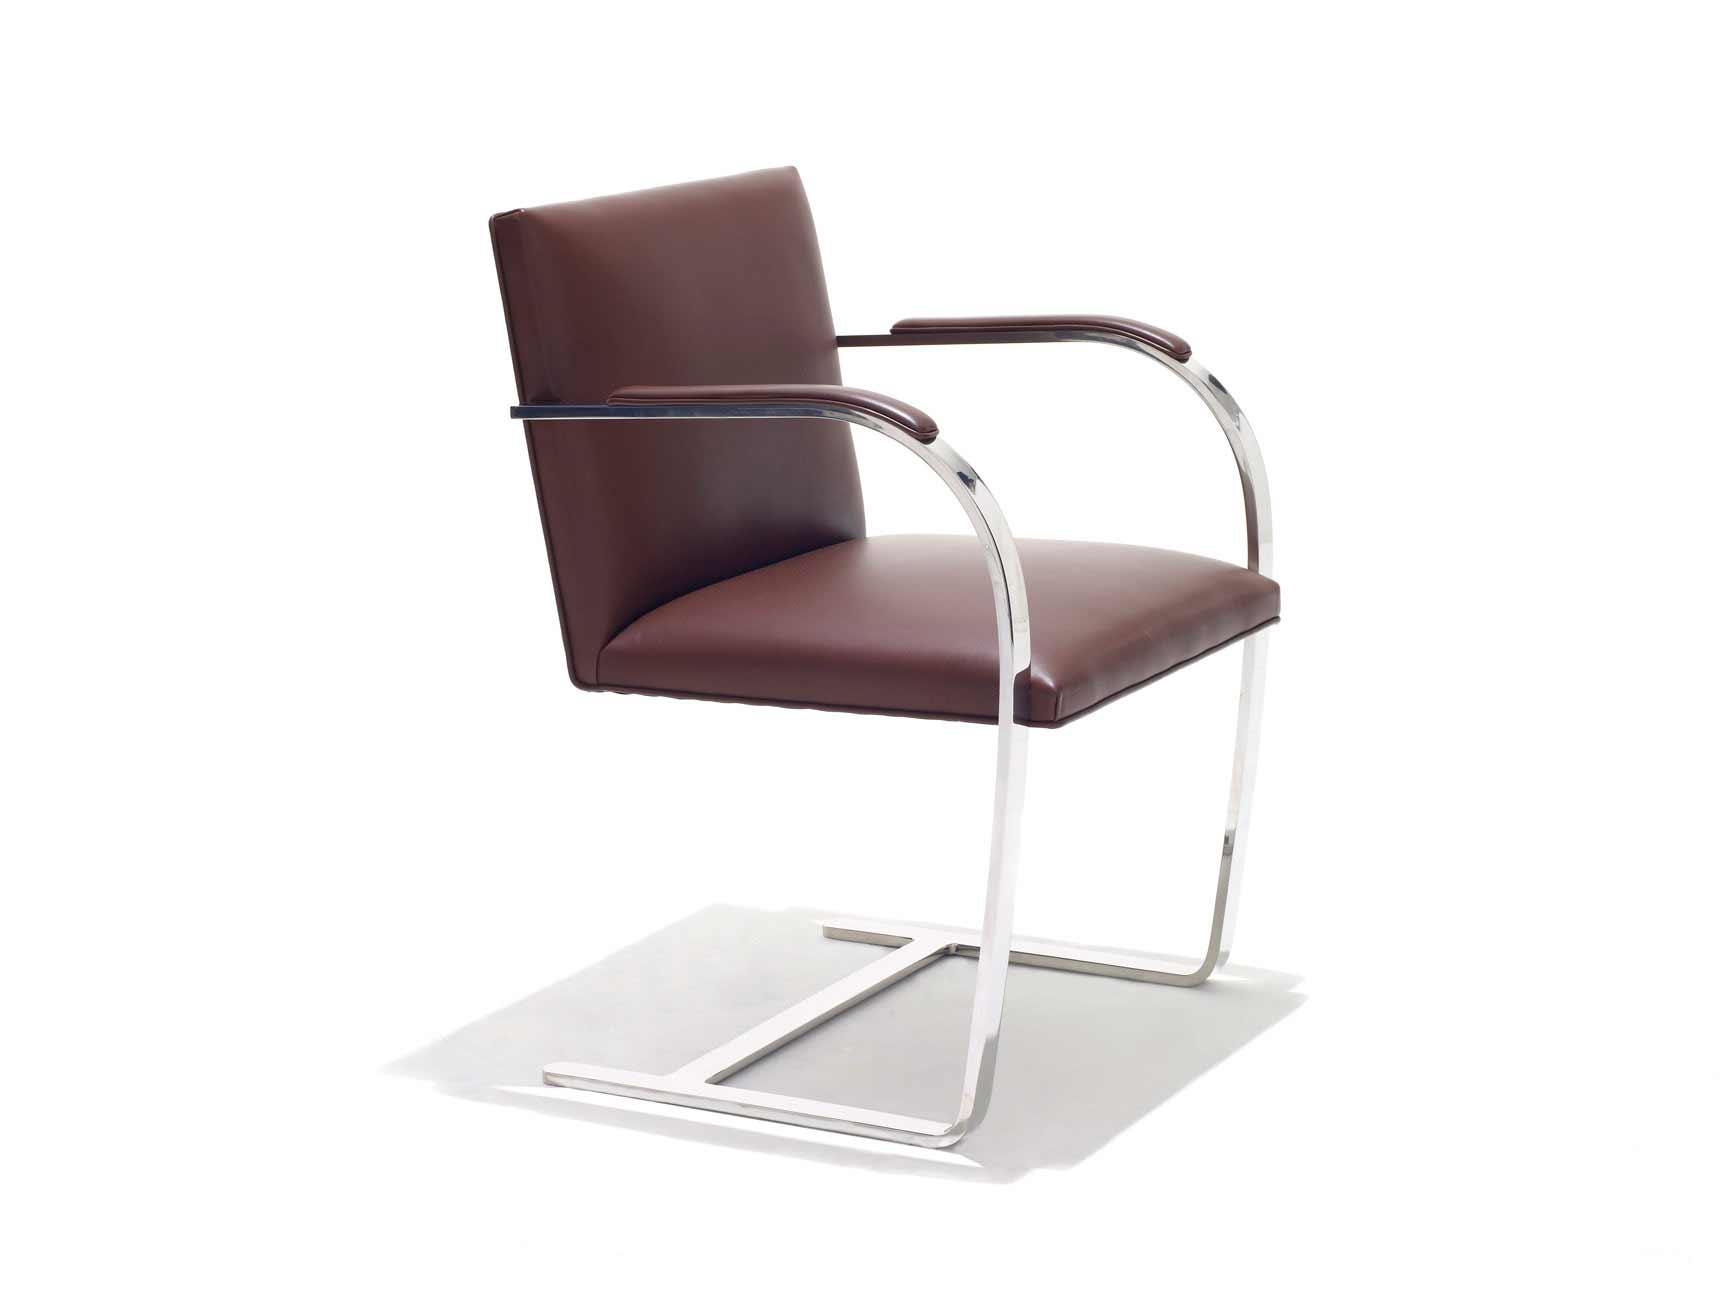 KnollStudio Brno stylish flat bar chairs with backs